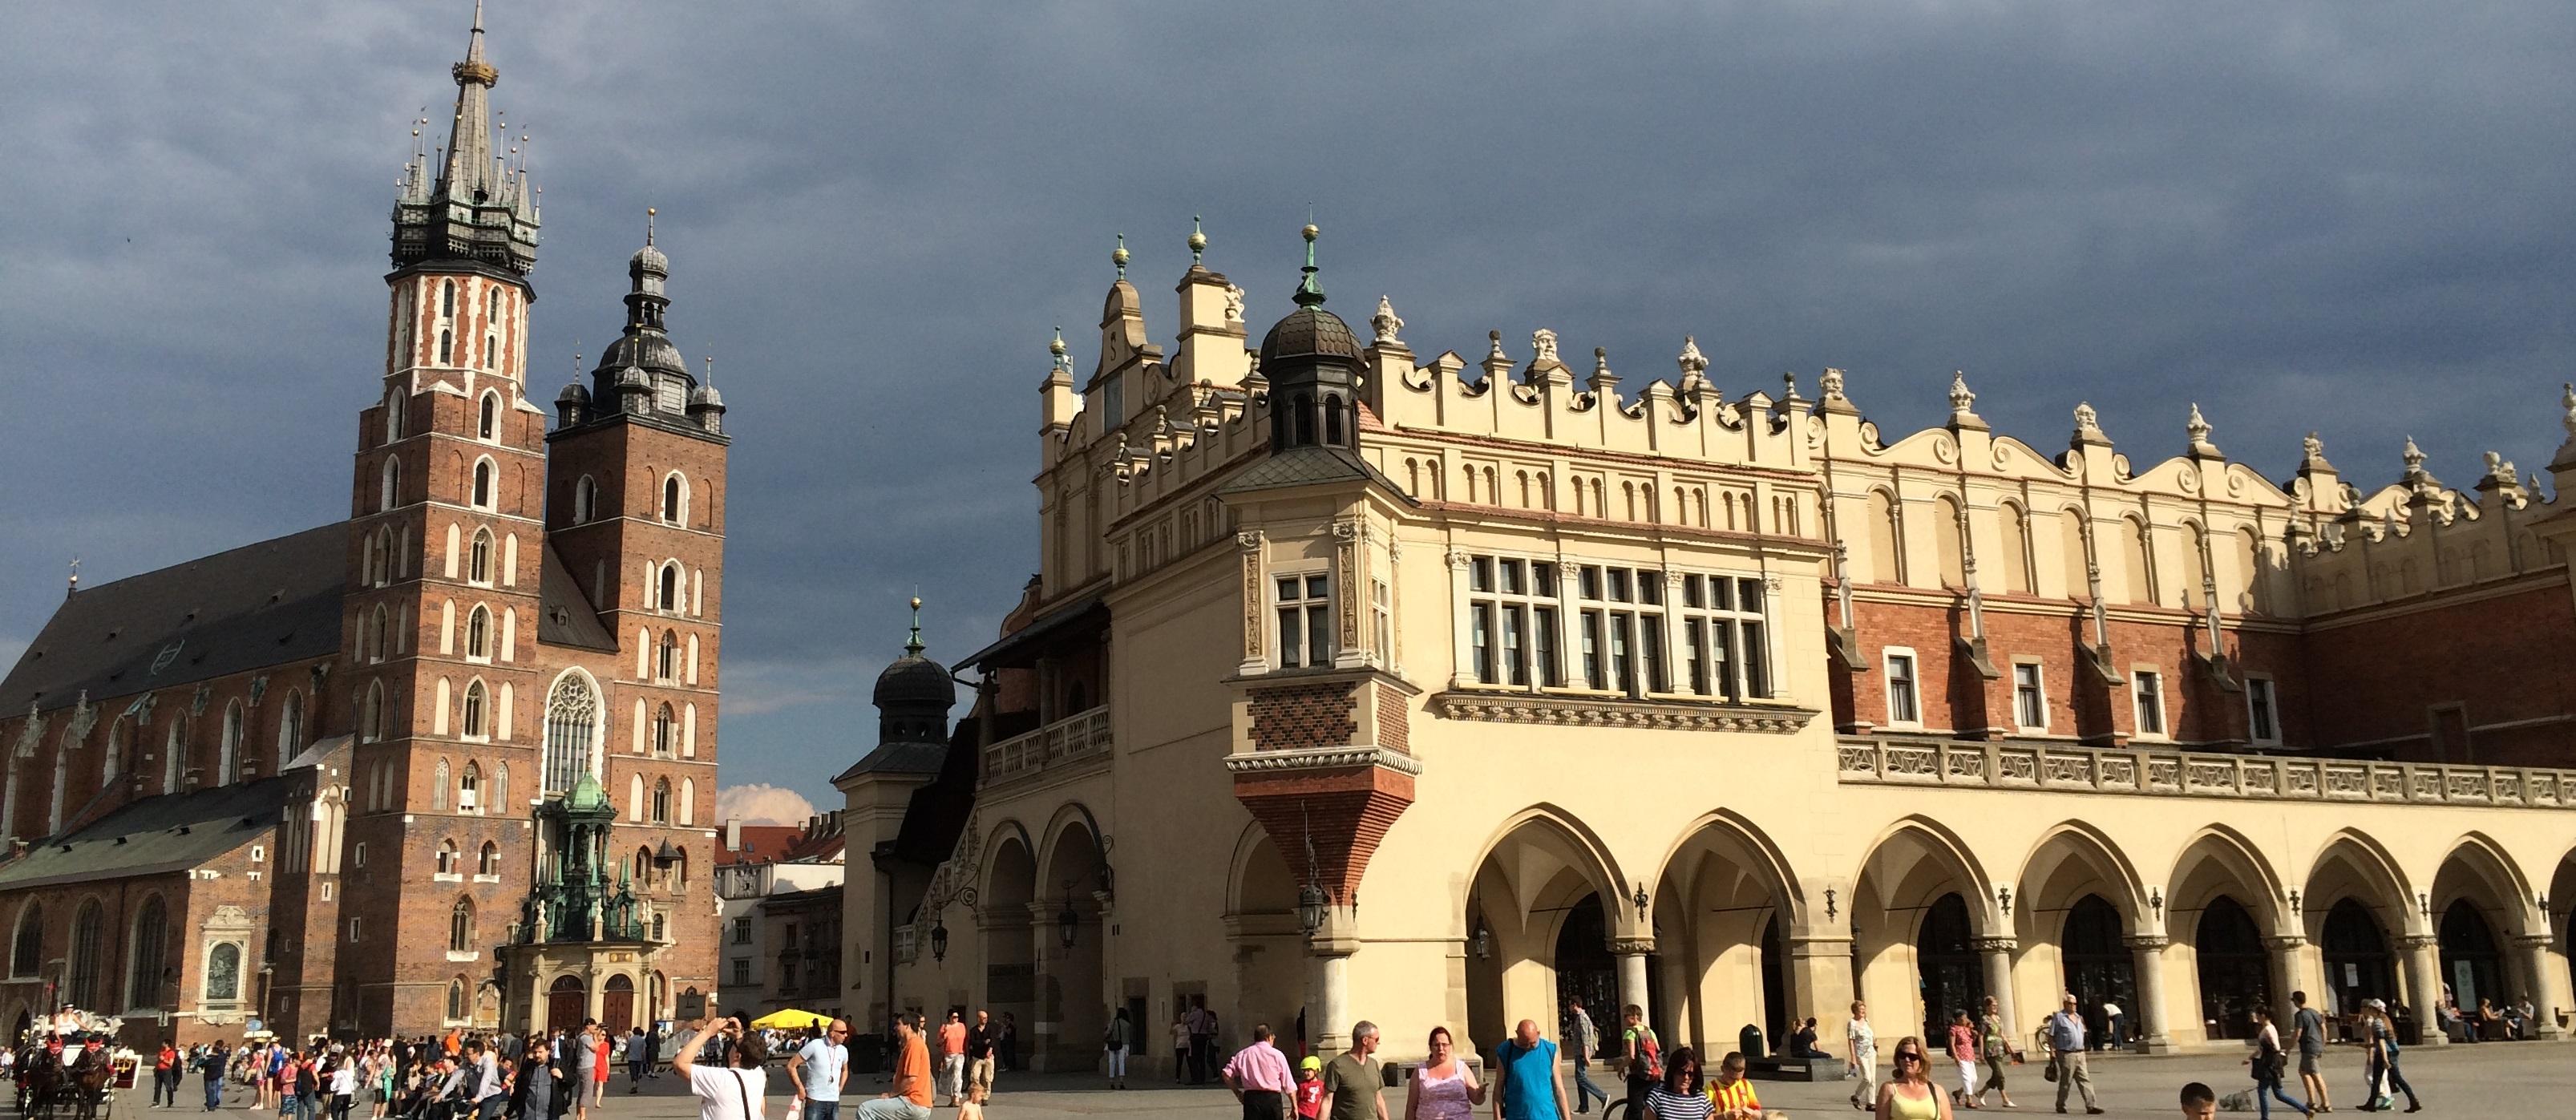 Krakow torget